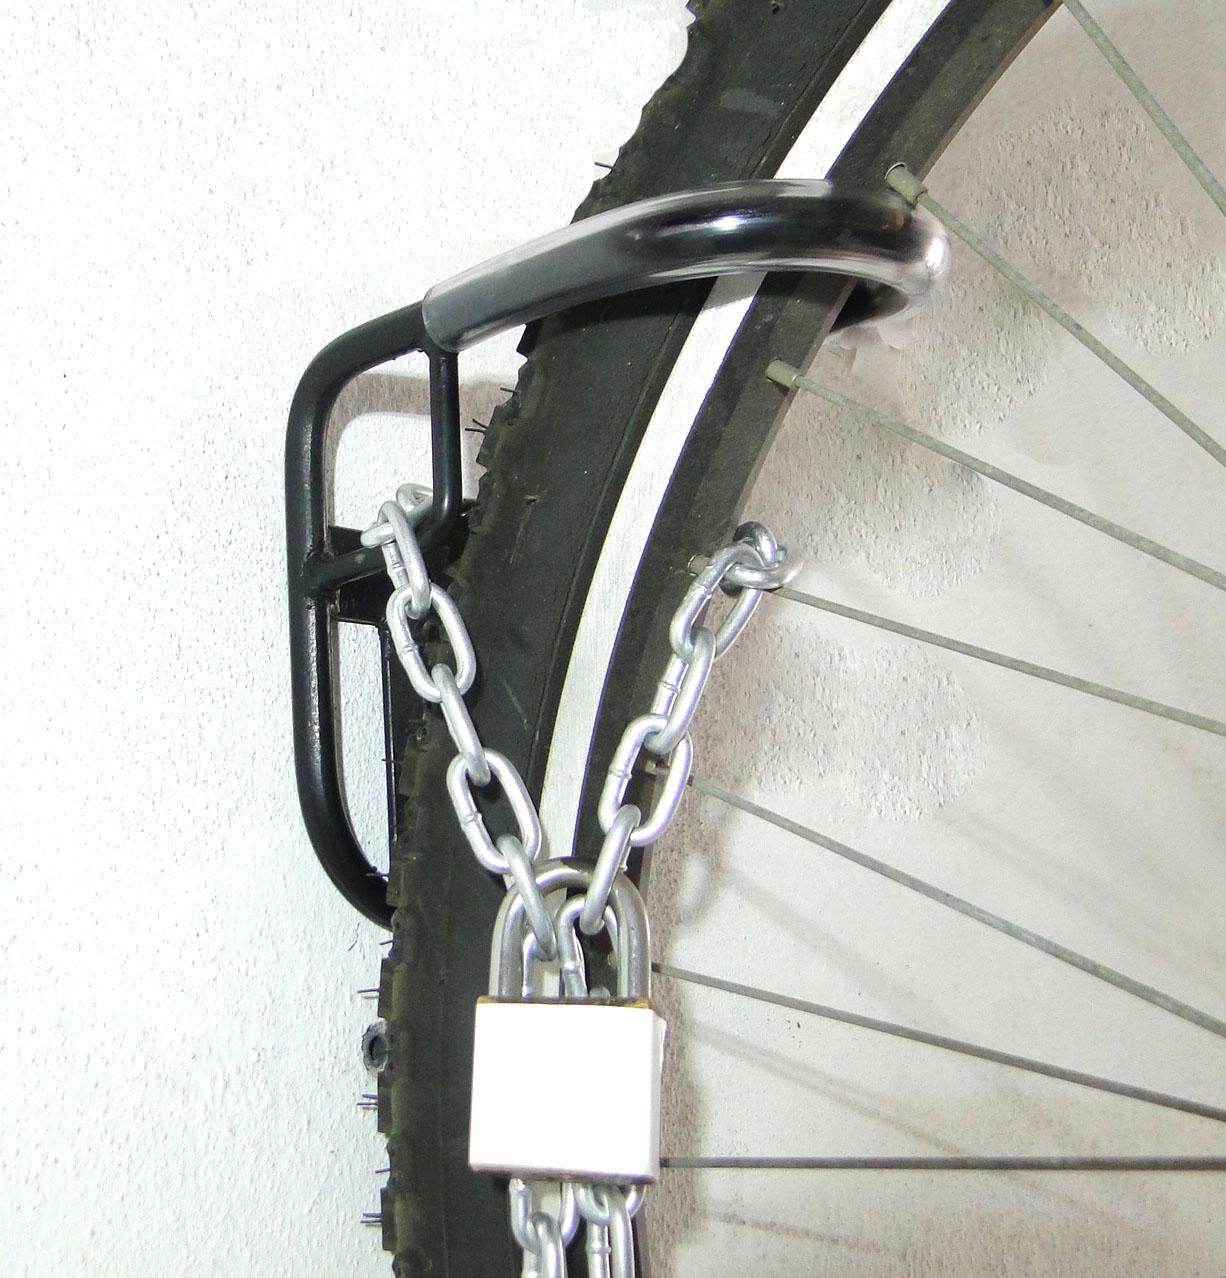 Suporte Bicicleta Para Pendurar Bike Parede No Elo7 Luis Emanoel